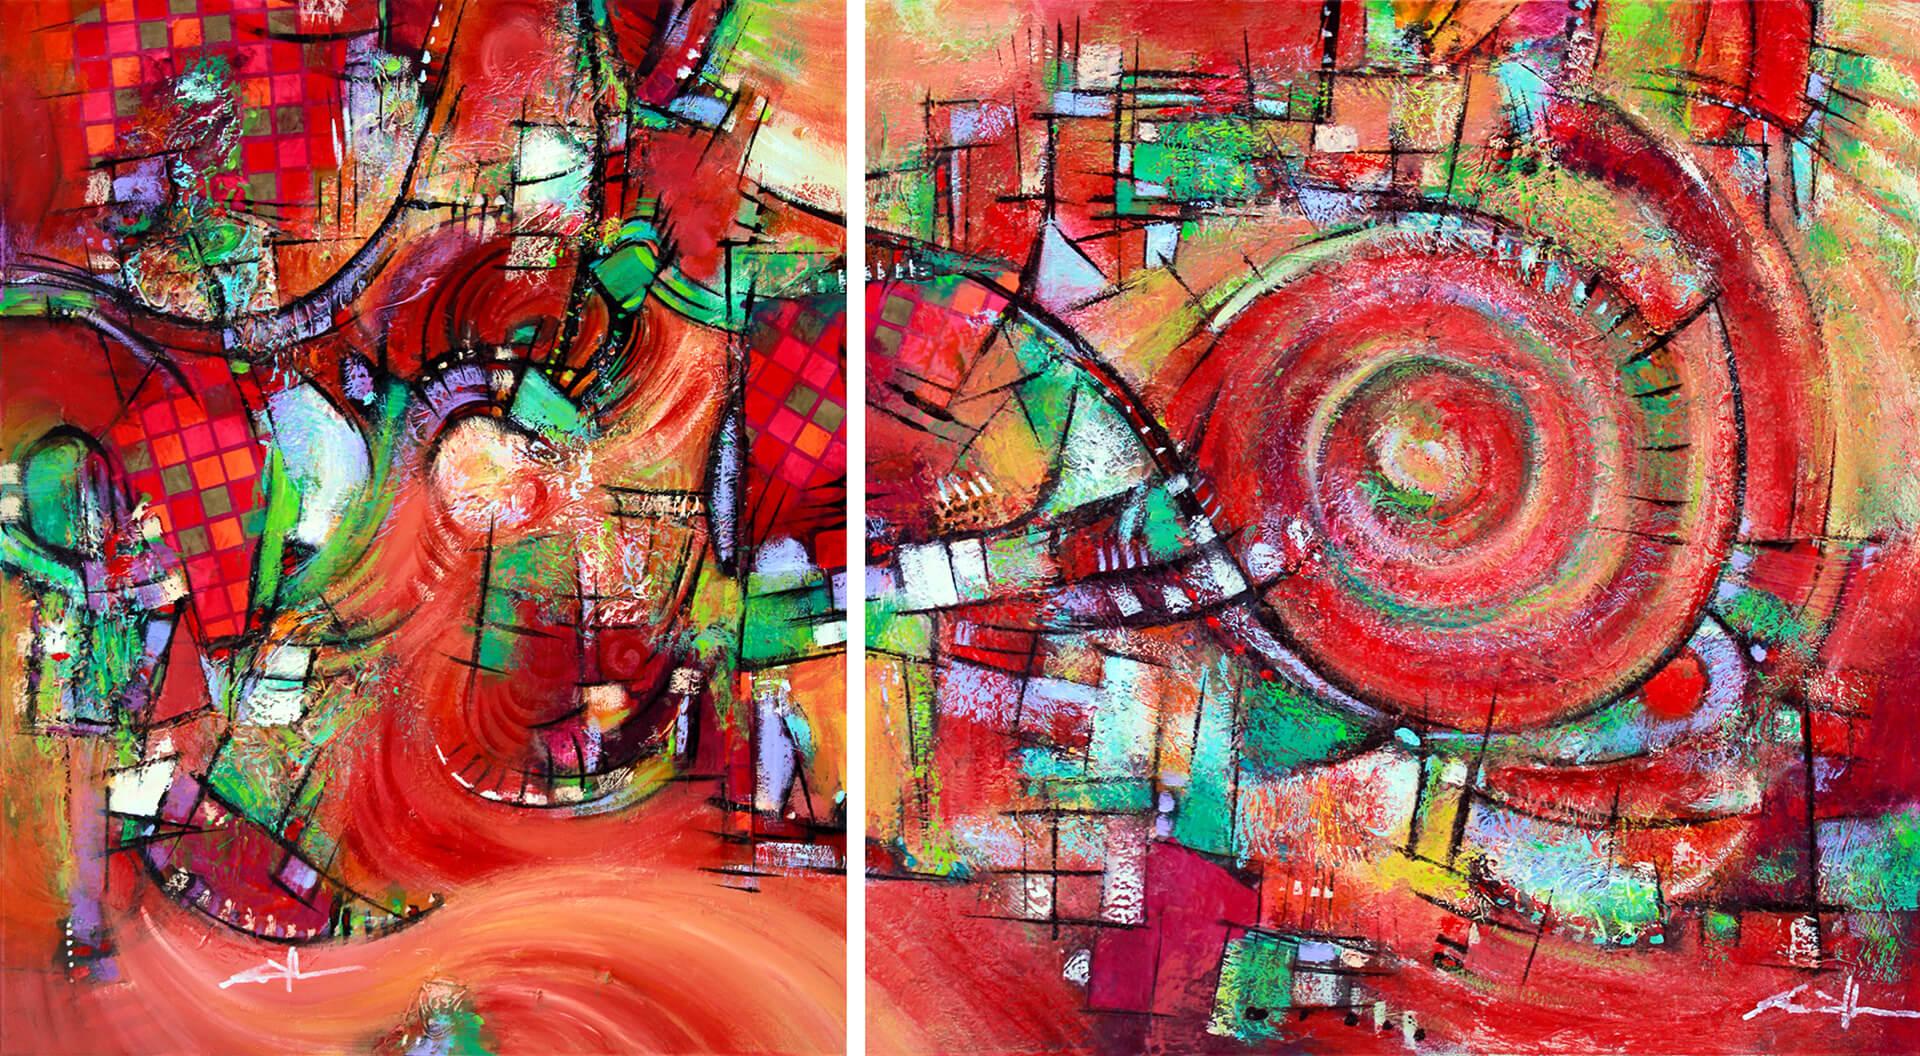 art-eric-j-hughes-artiste-peintre-canadien-tableau-symbiose-ecarlate-polyptyque-cd